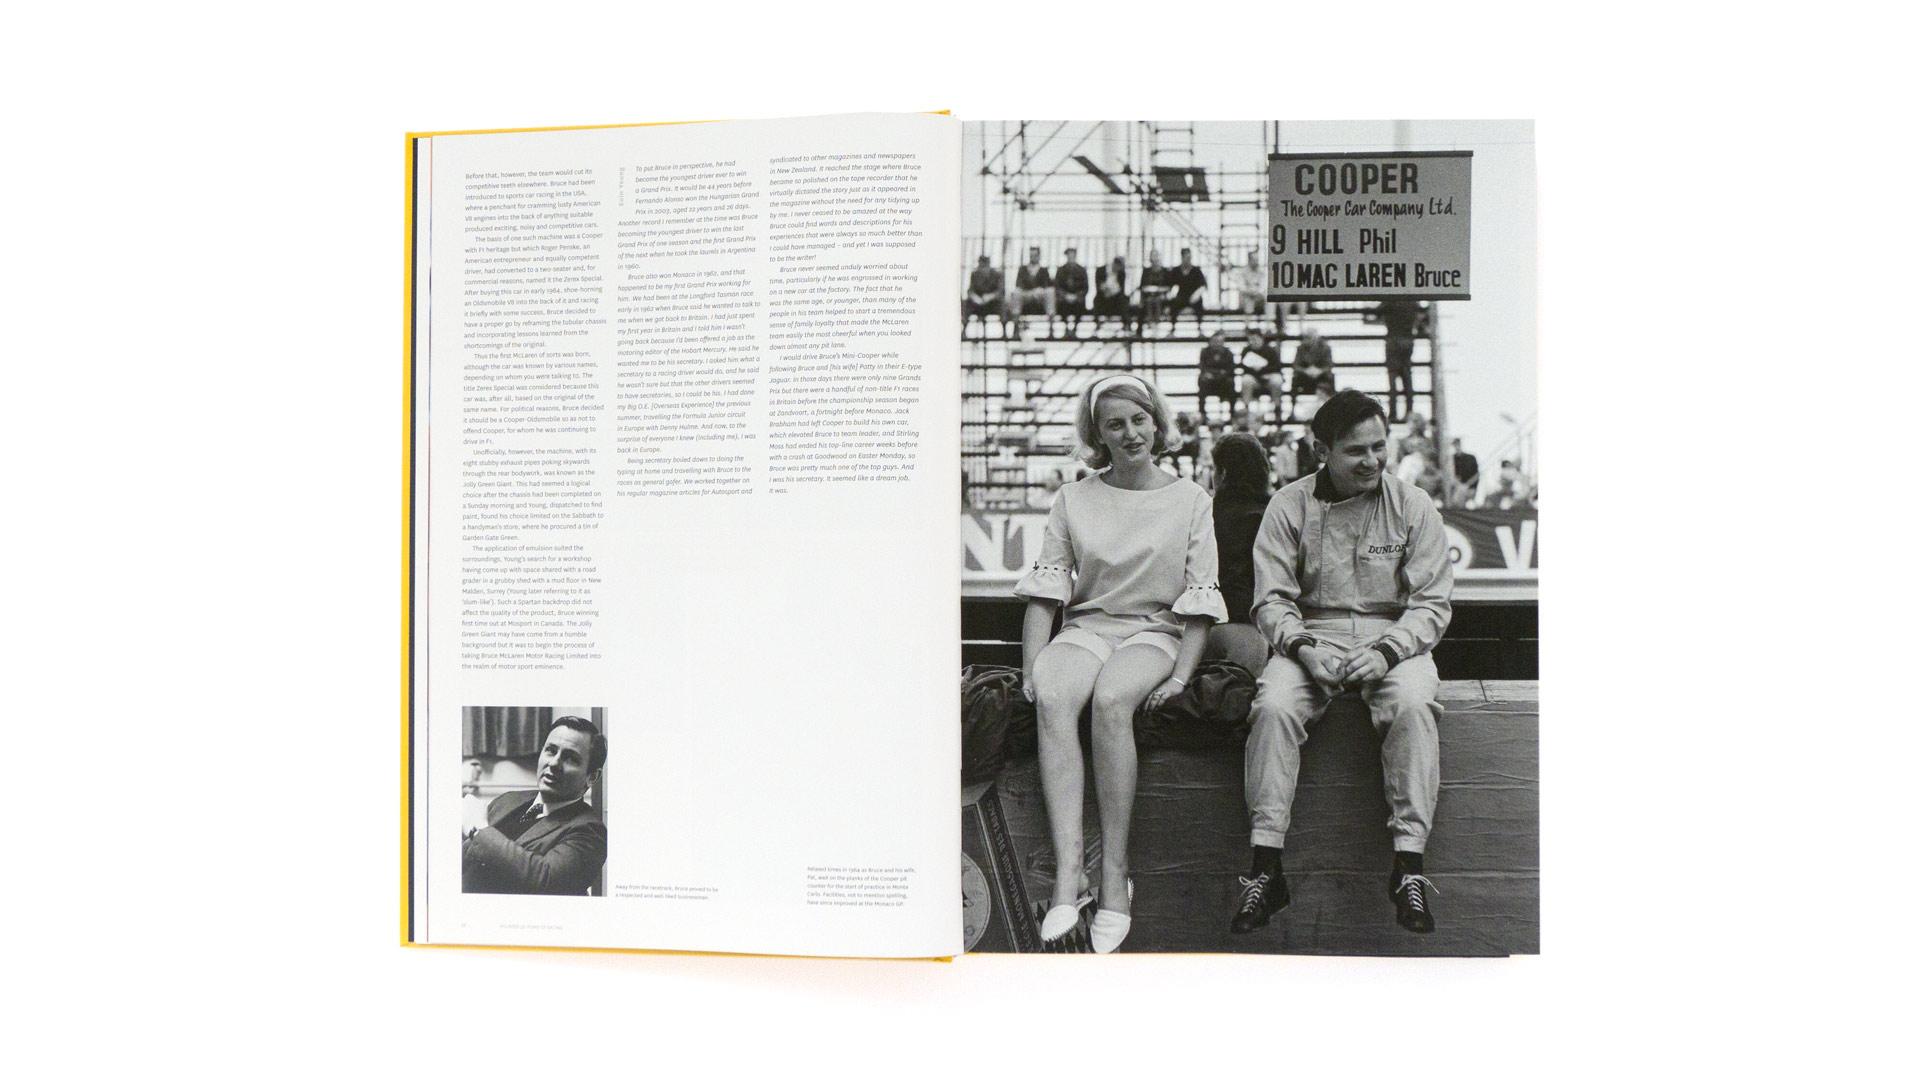 mclaren - 50 years of racing | thomas manss & company